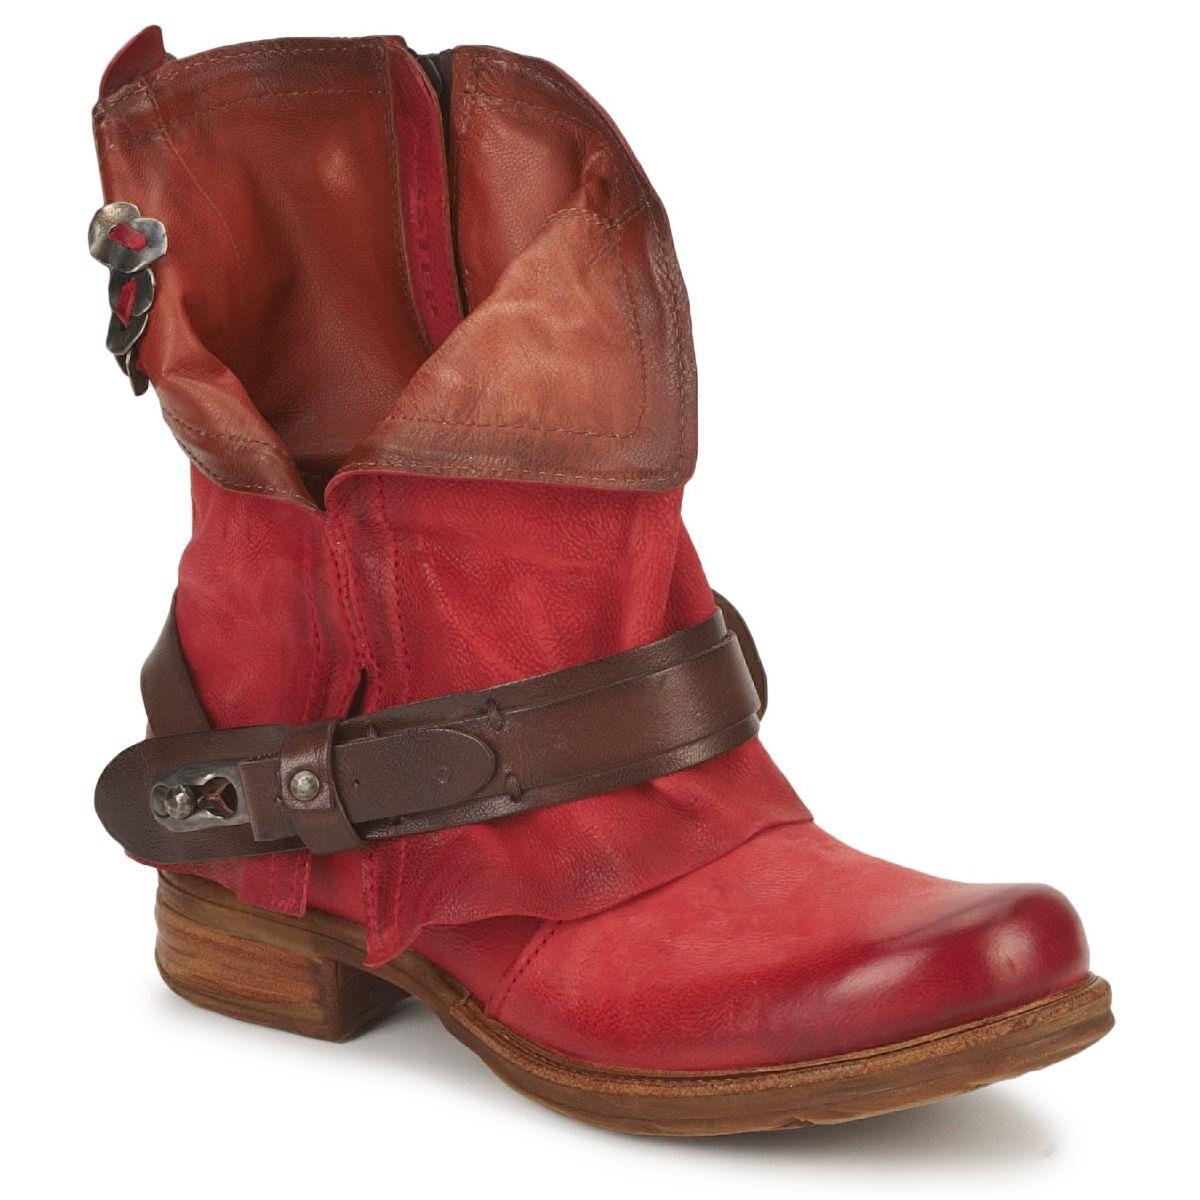 b57d4ca66392b Bota baja Air Step SAINT BIKE Rojo - Entrega gratuita con Spartoo.es ! -  Zapatos Mujer 199